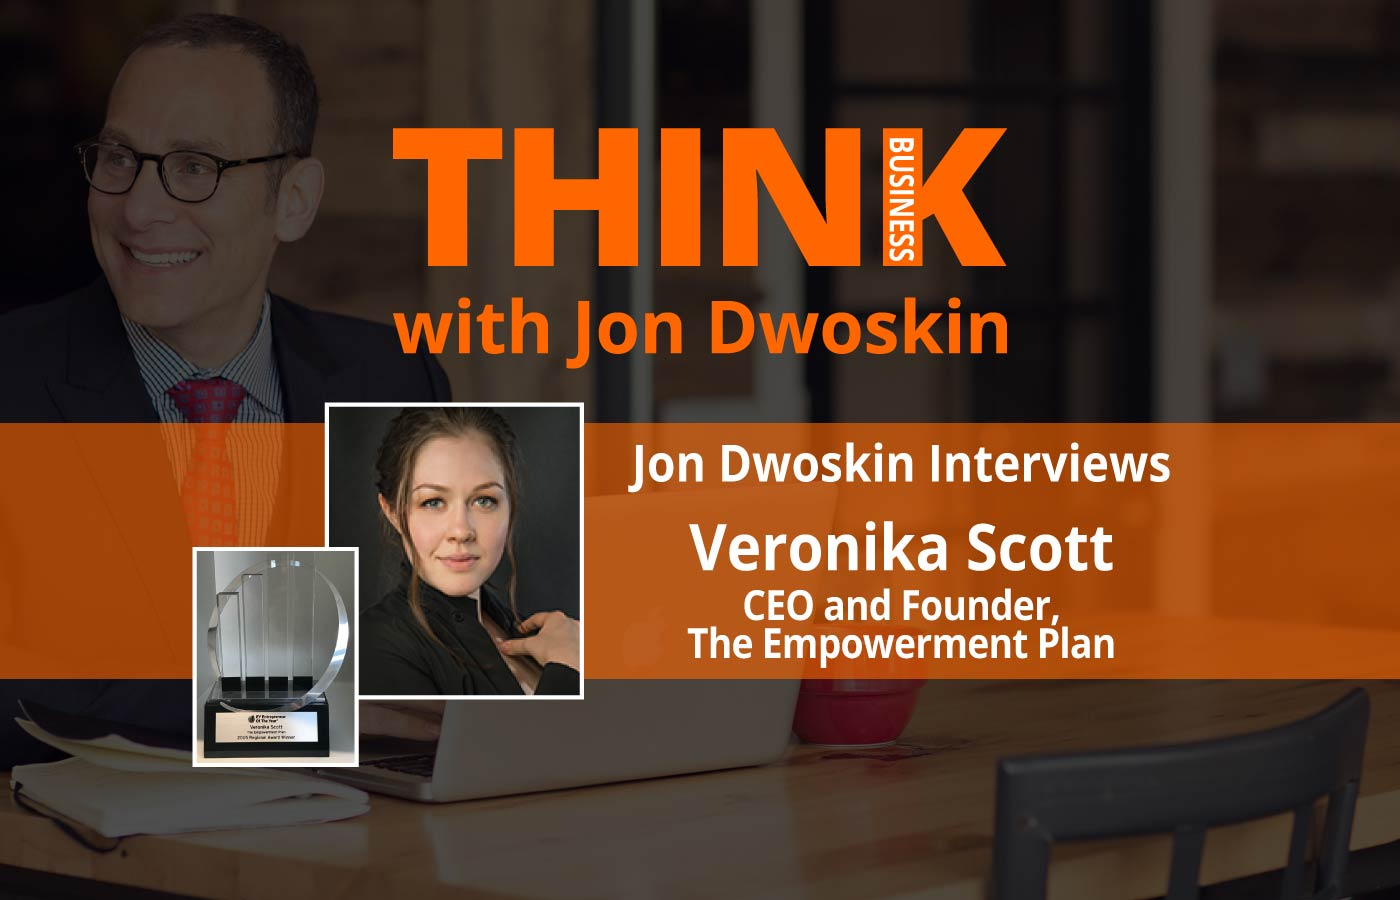 THINK Business: Jon Dwoskin Interviews Veronika Scott, CEO and Founder of The Empowerment Plan